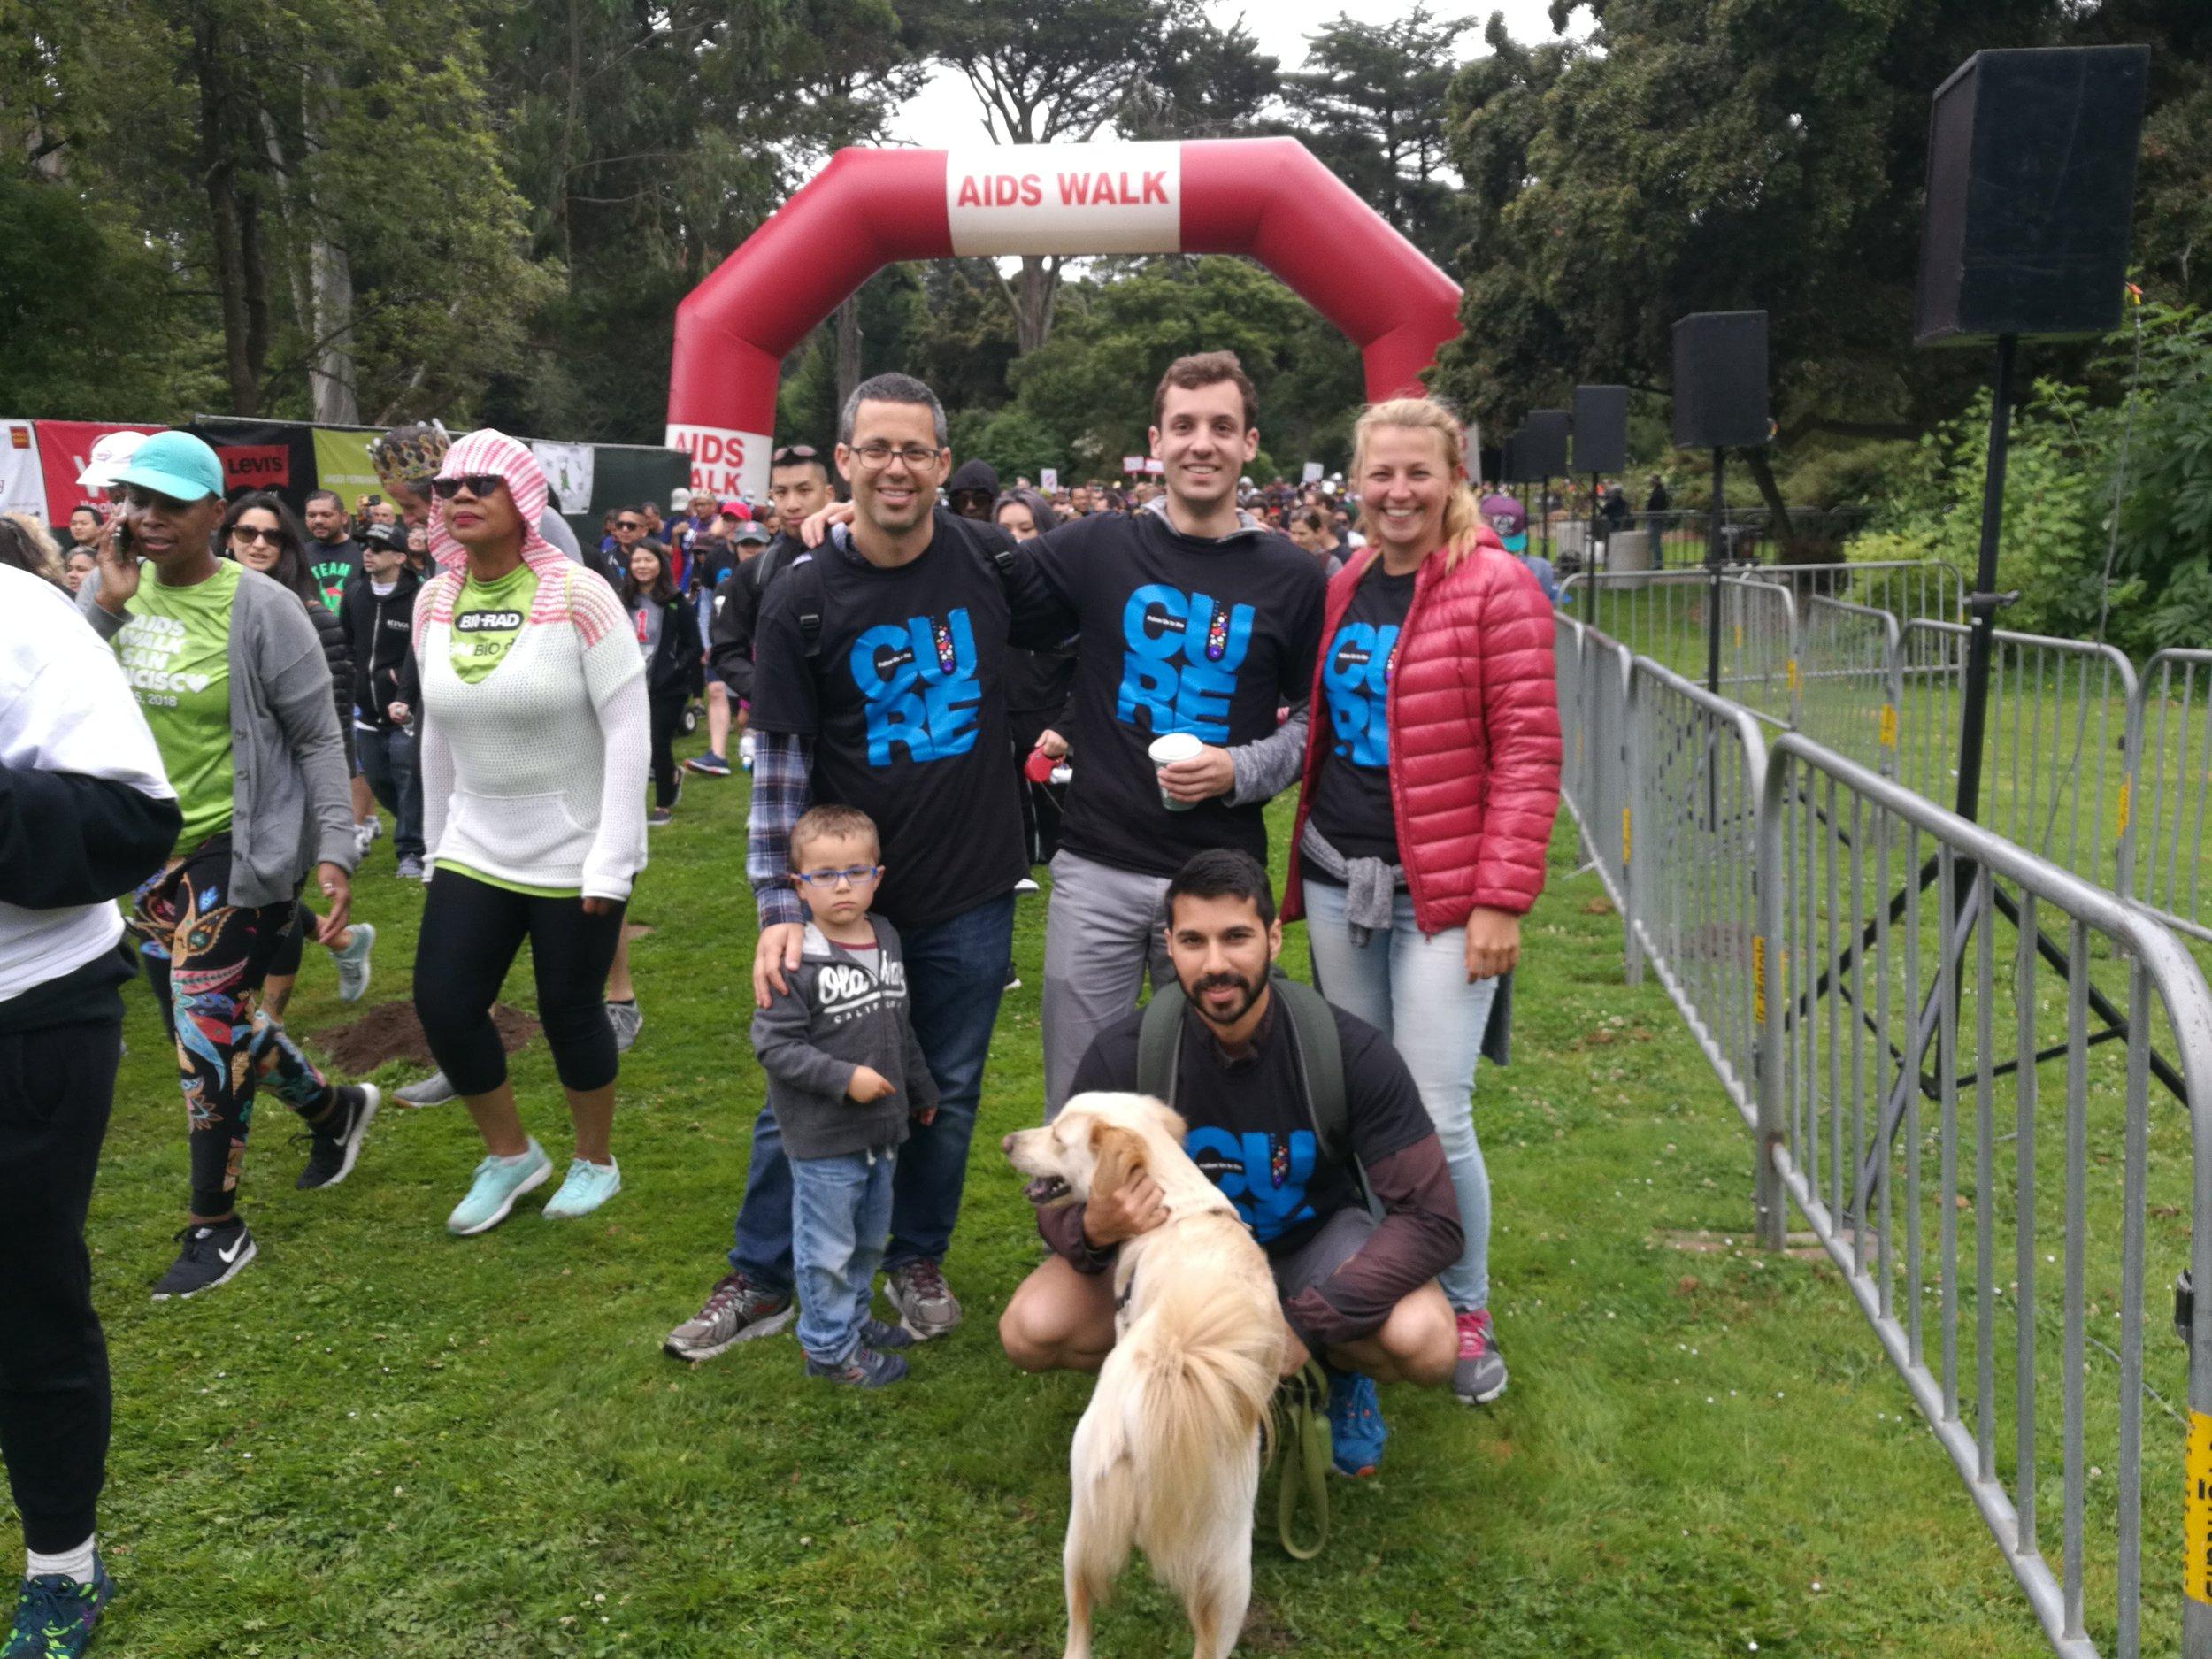 Noam, Alon, Josh, Ravi and Maike, warming up for Gladstone's 2018 AIDS walk